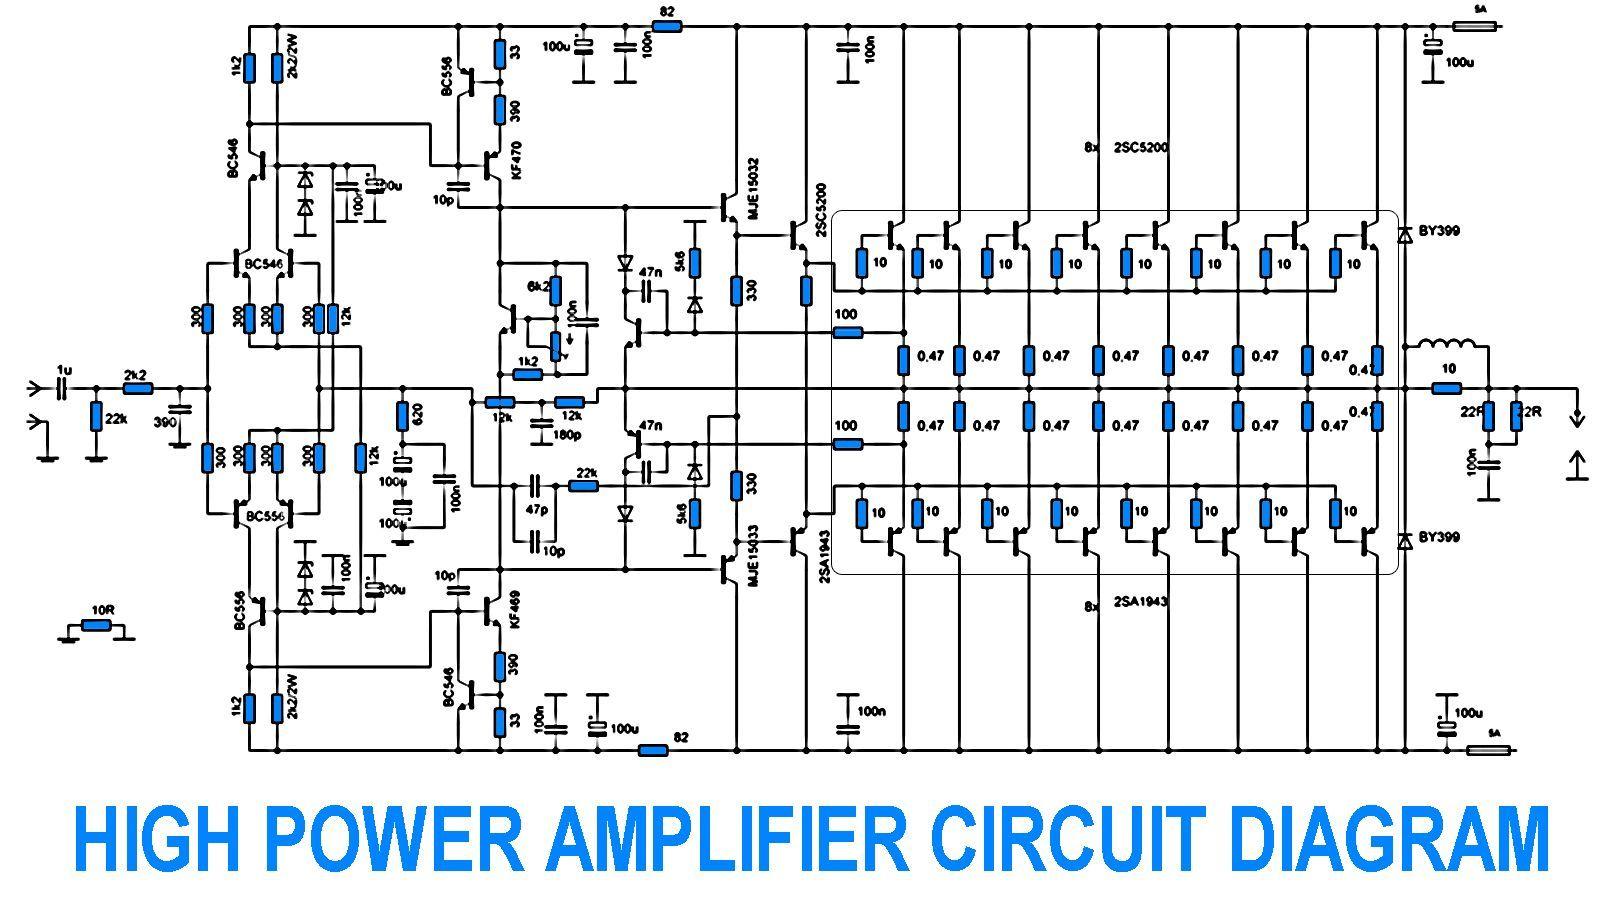 medium resolution of high power amplifier circuit diagram circuit schematic electronics power amplifier with high power amplifier